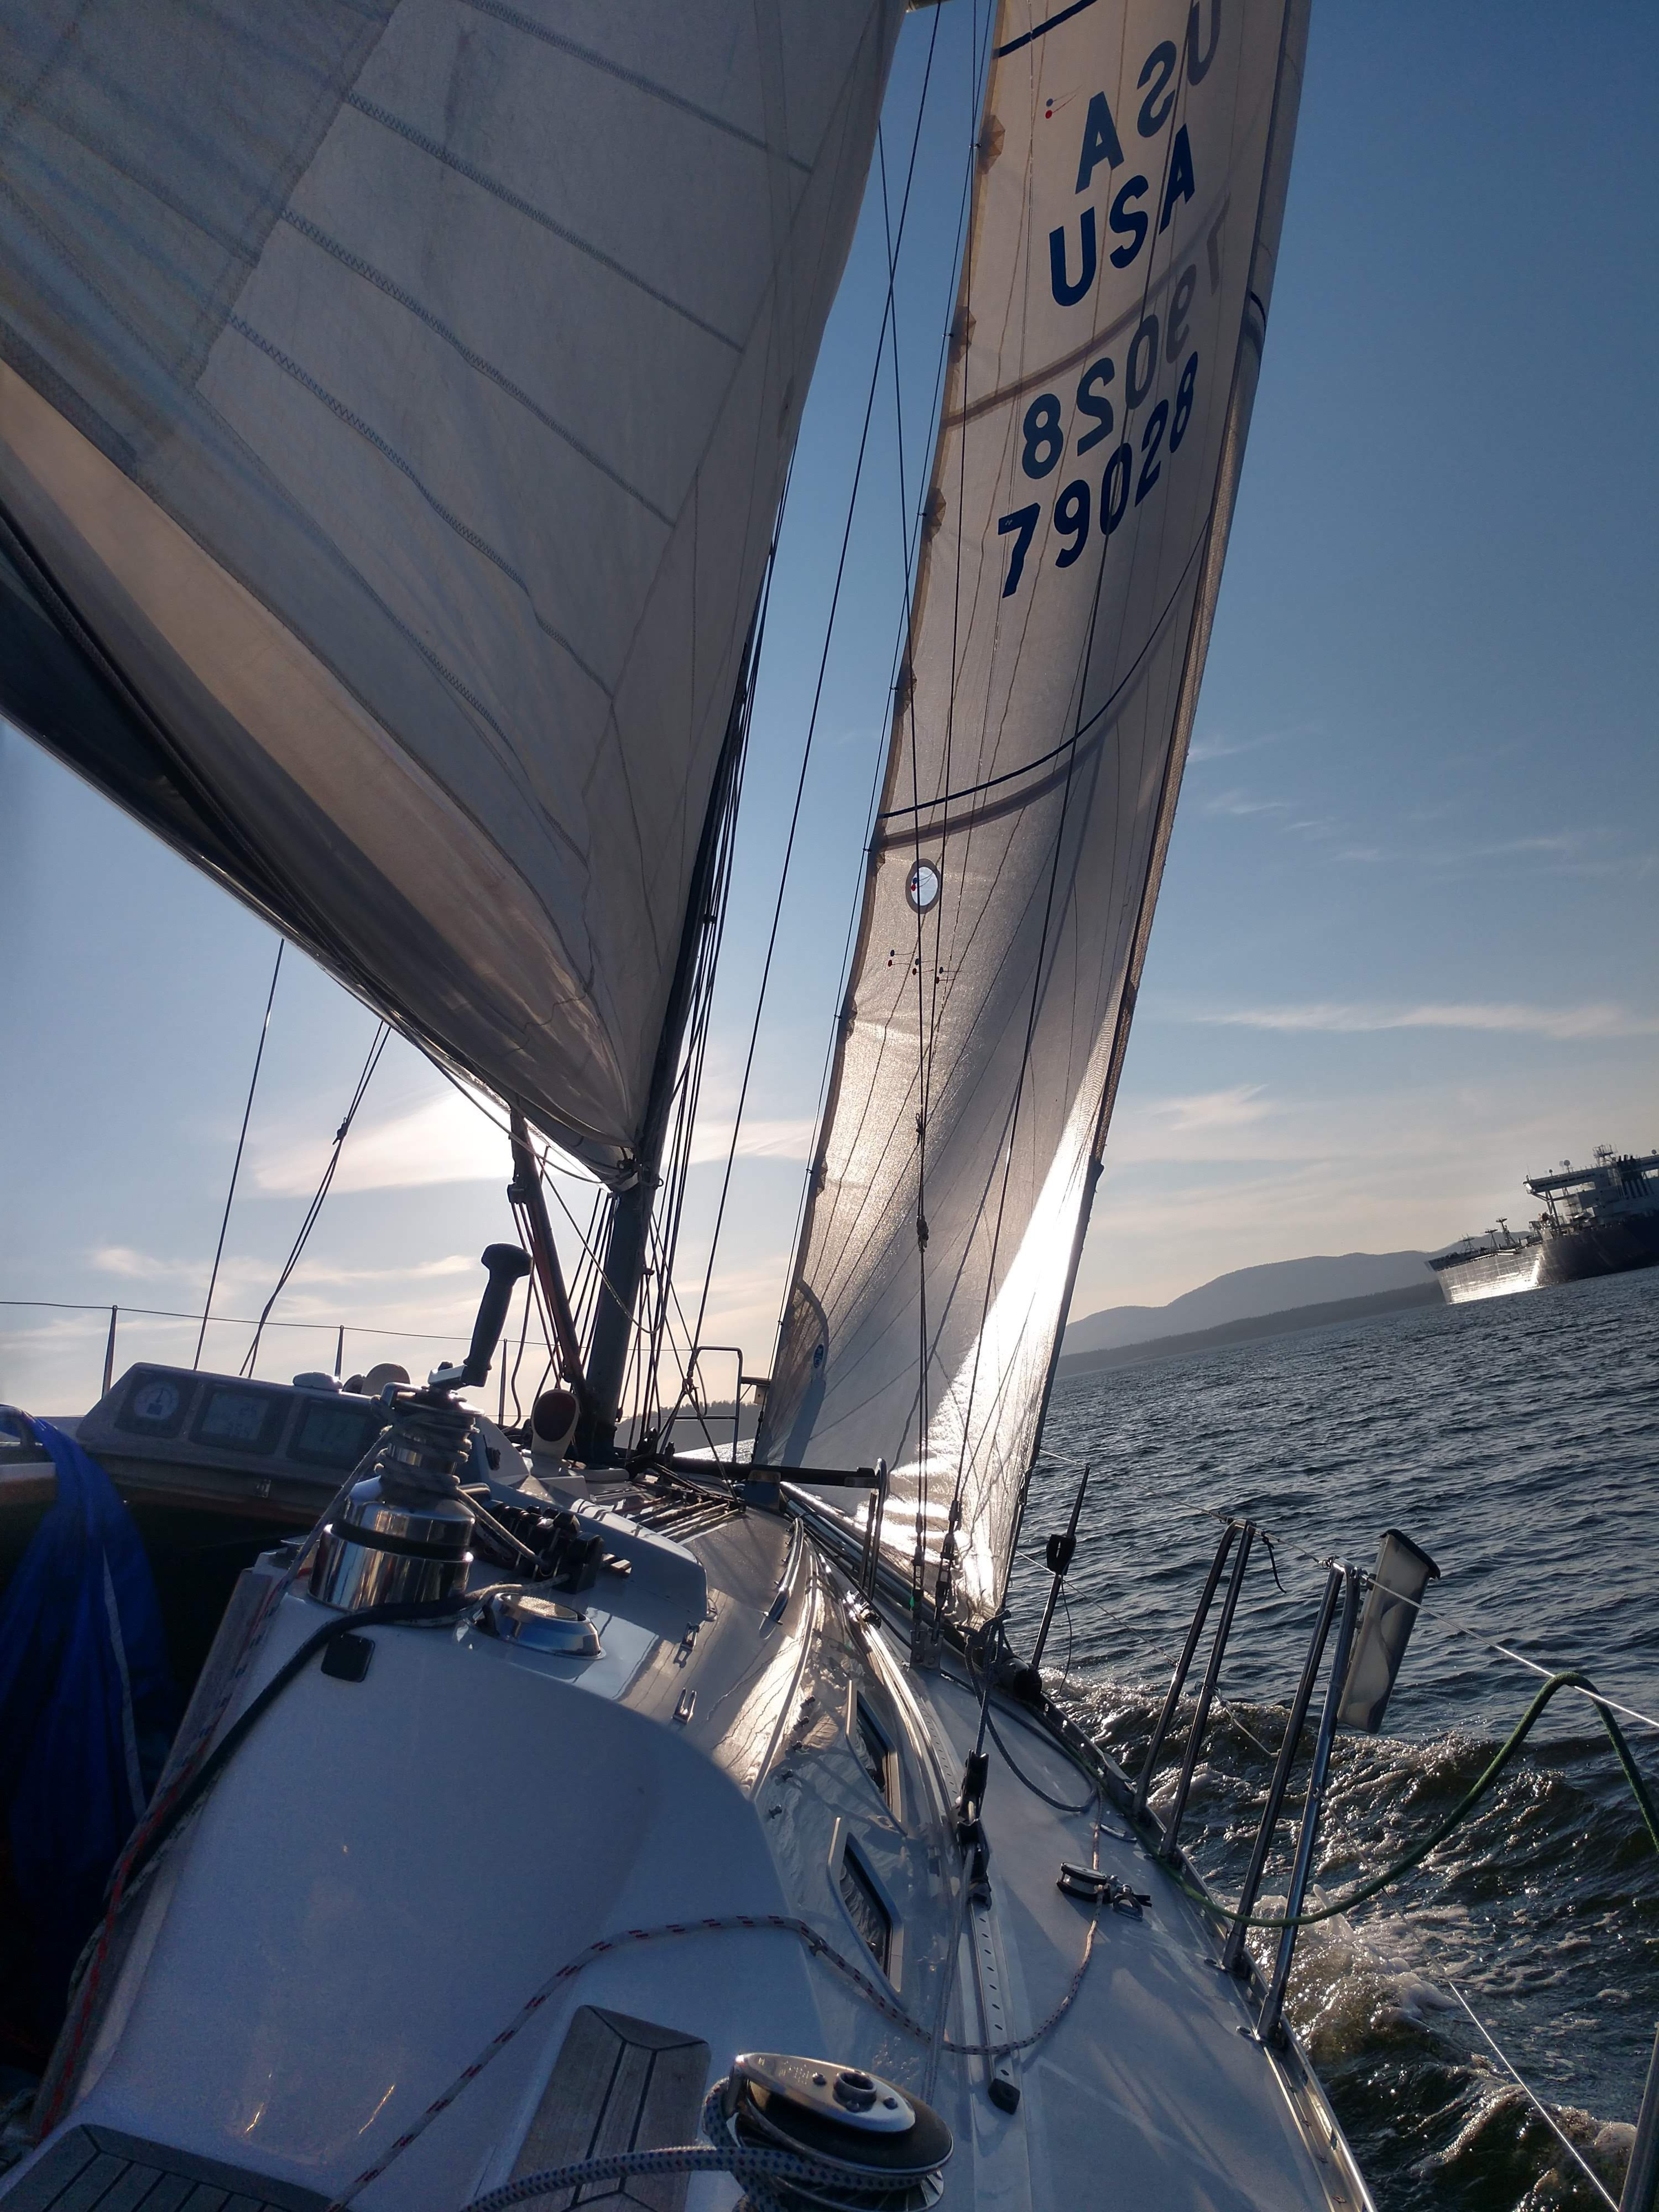 Full Day Sail